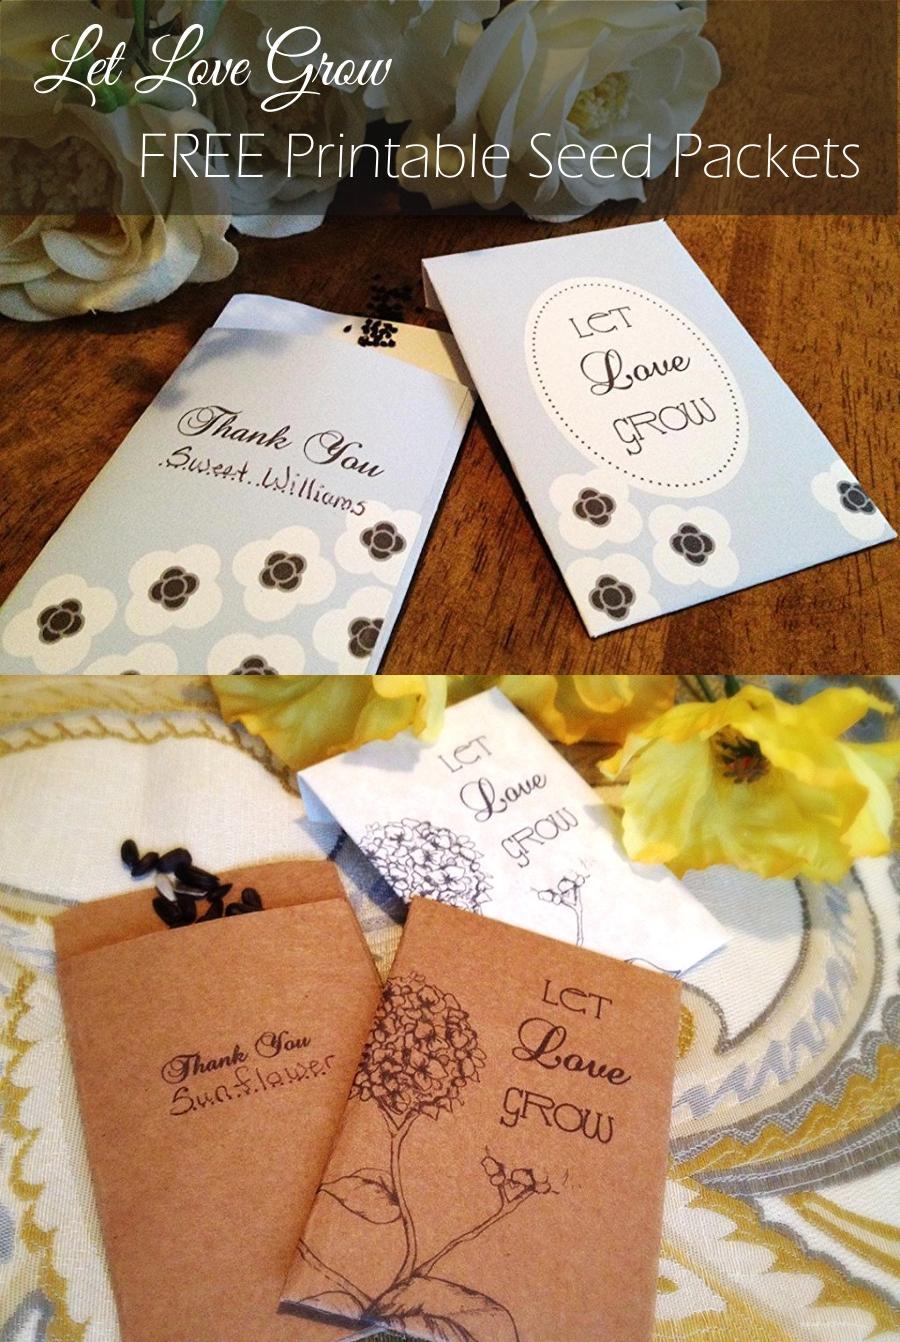 simply cassie lynn designs free let love grow printable seed